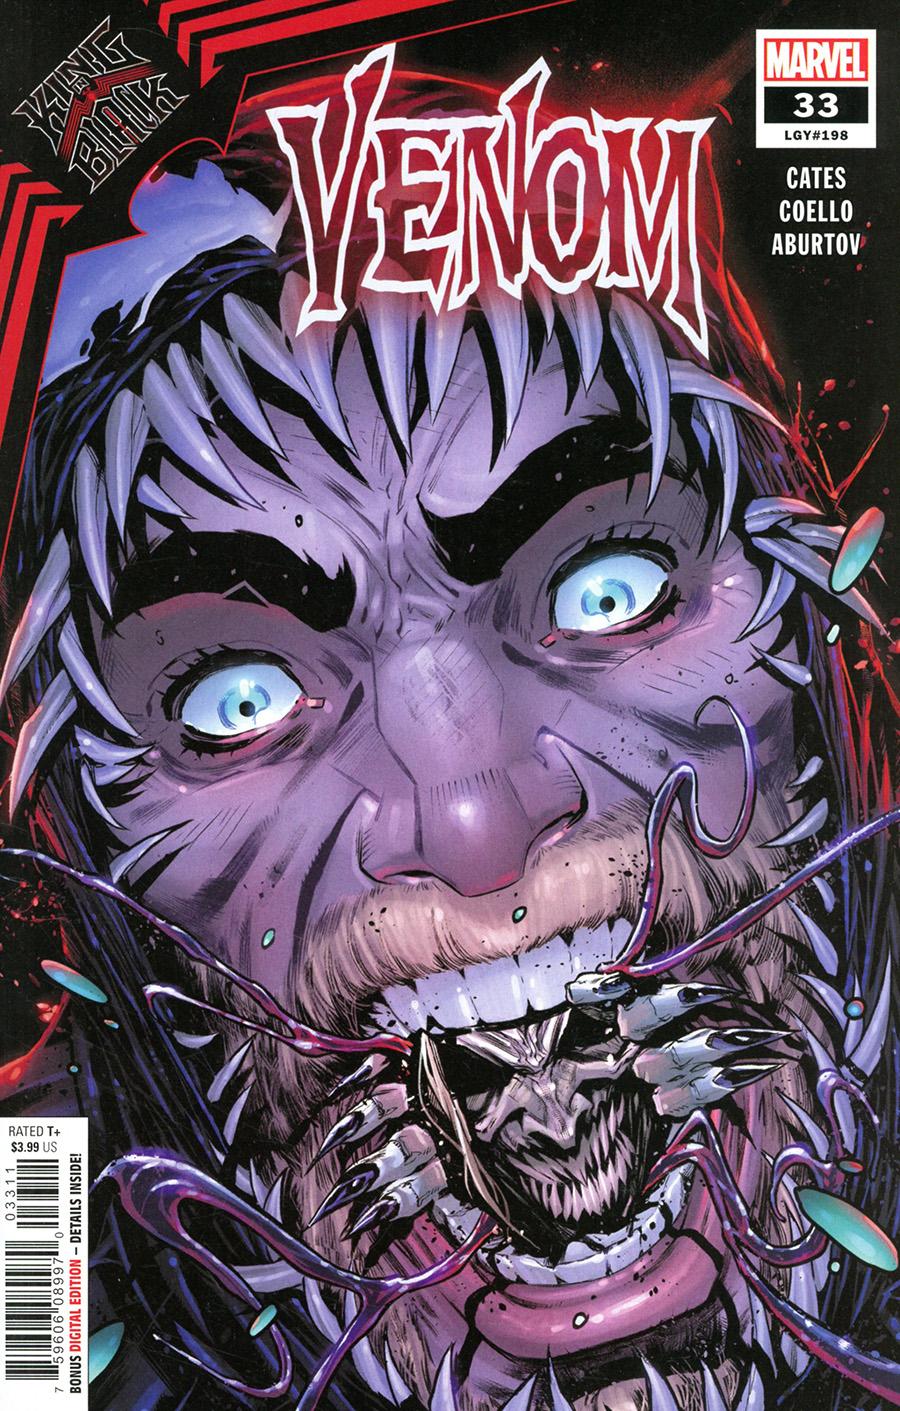 Venom Vol 4 #33 Cover A Regular Iban Coello Cover (King In Black Tie-In)